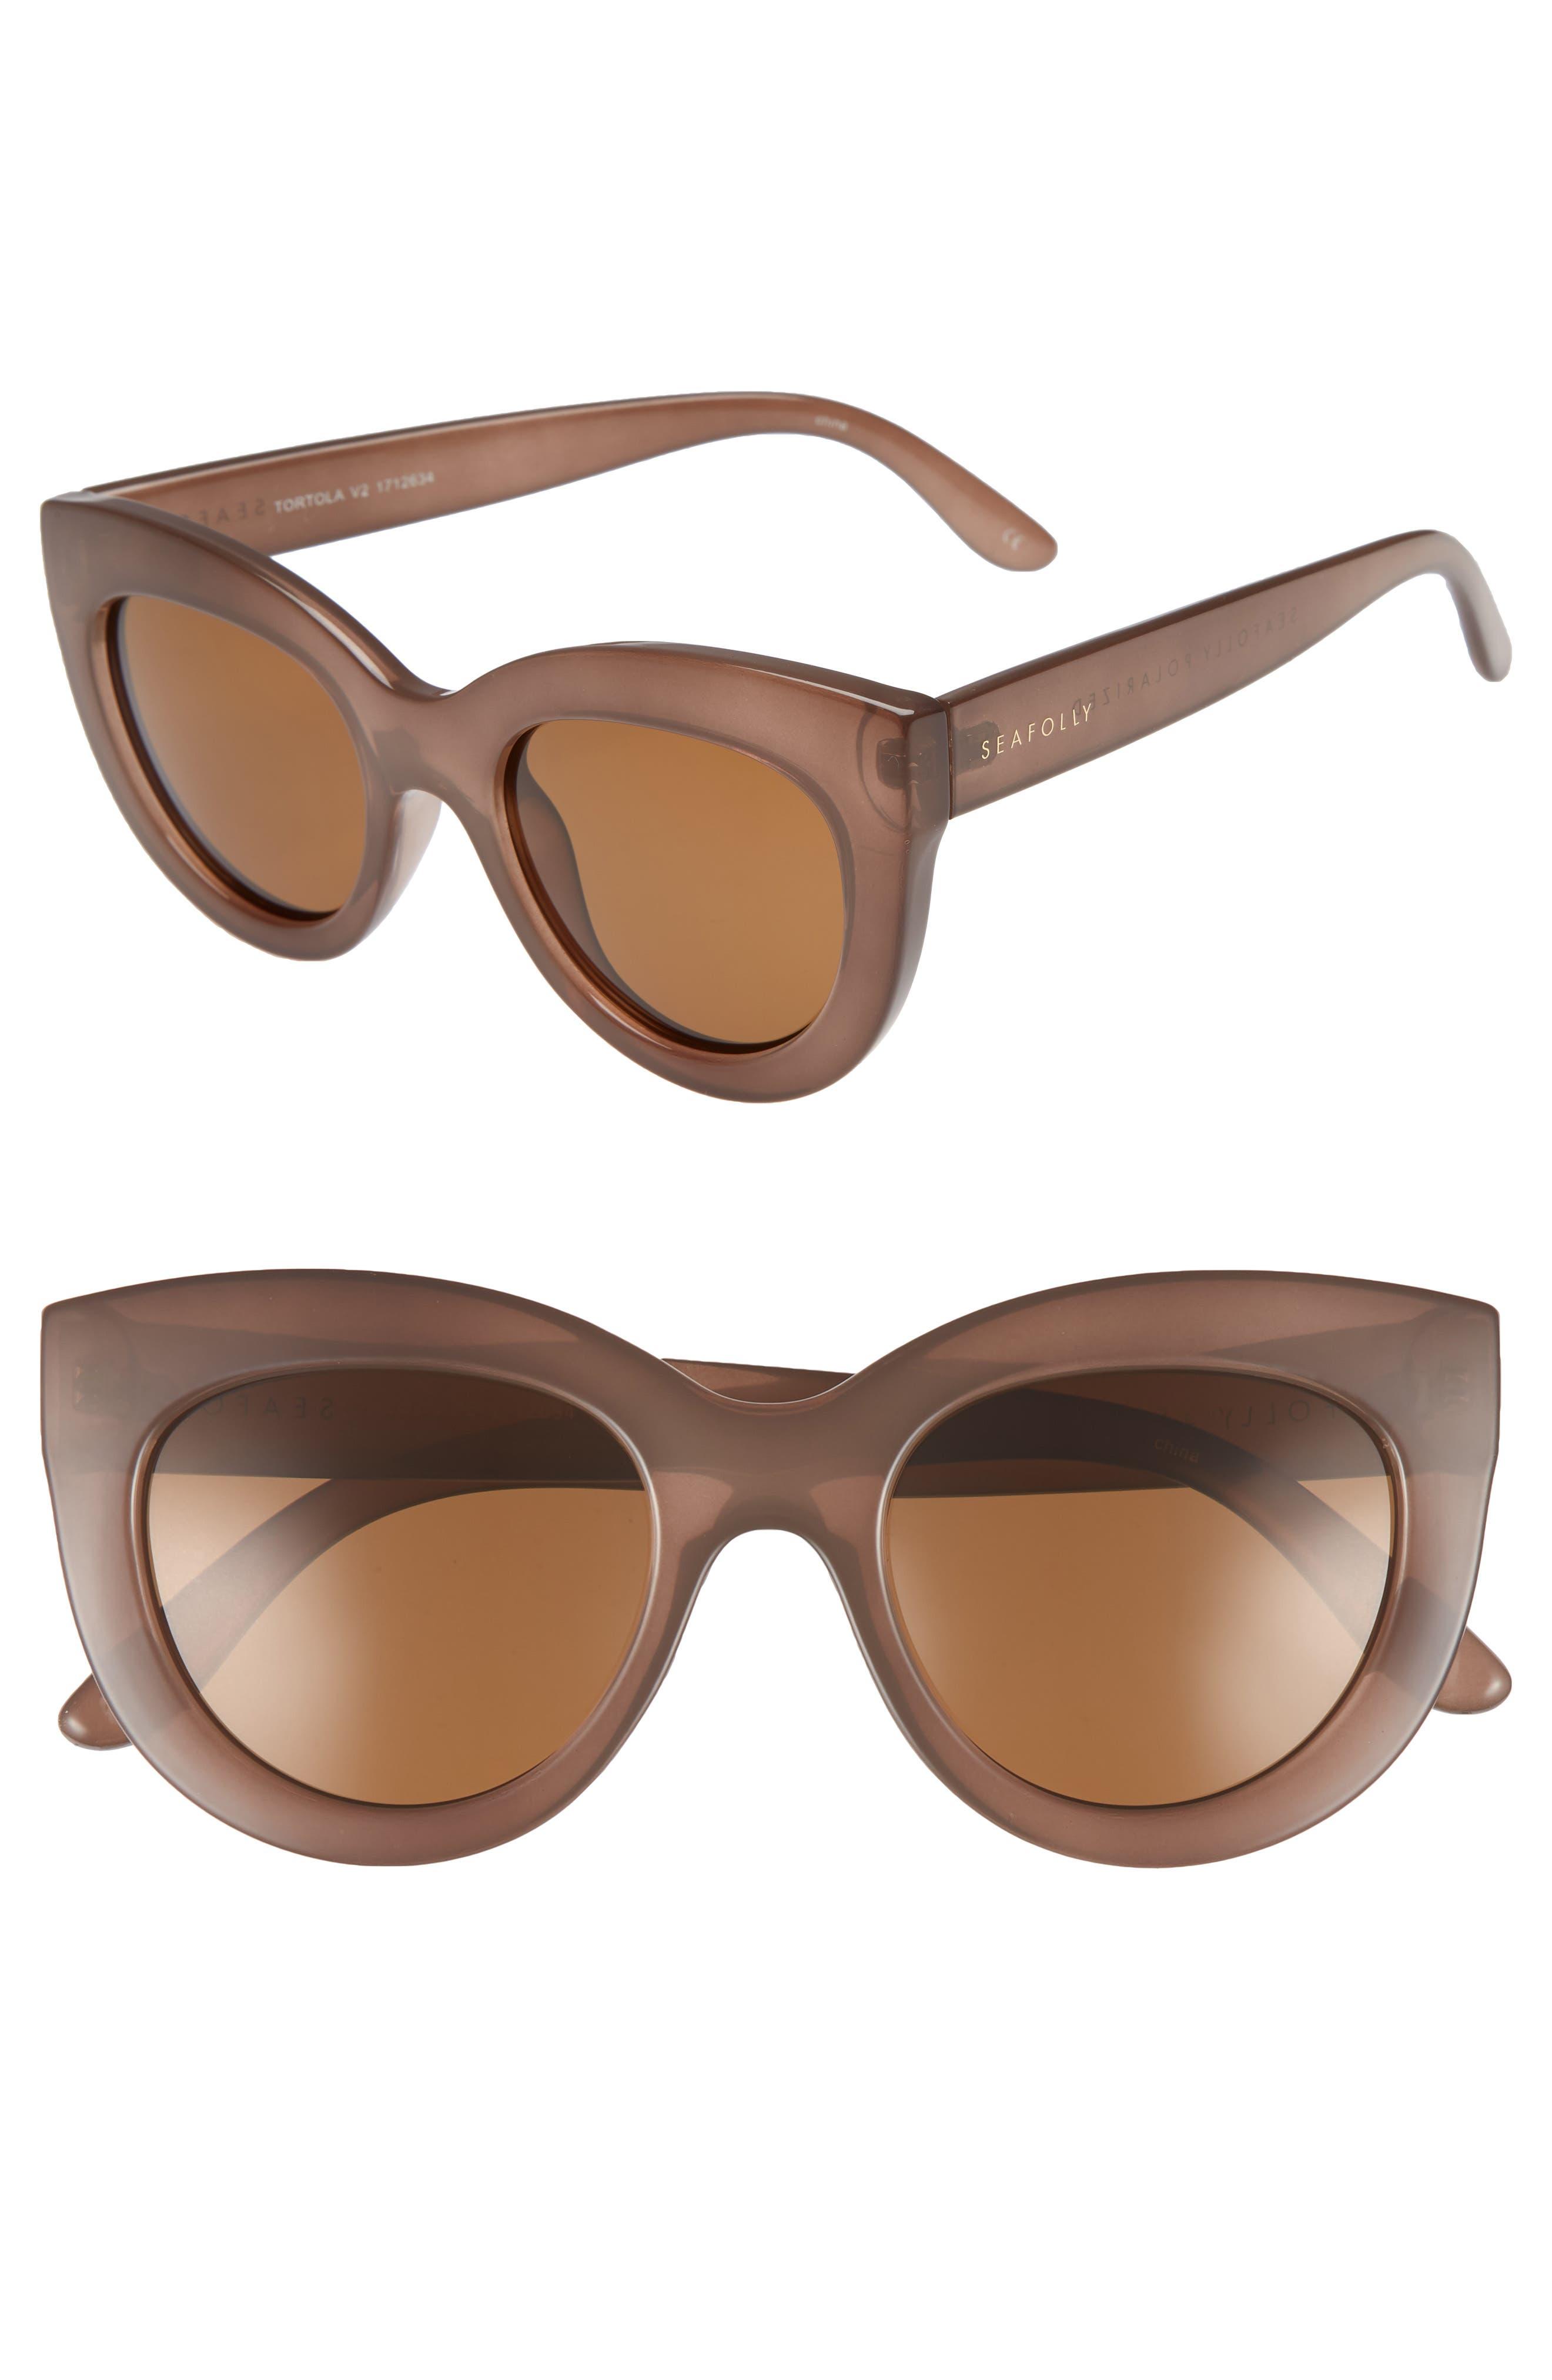 Tortola V2 51mm Polarized Cat Eye Sunglasses,                         Main,                         color, 200